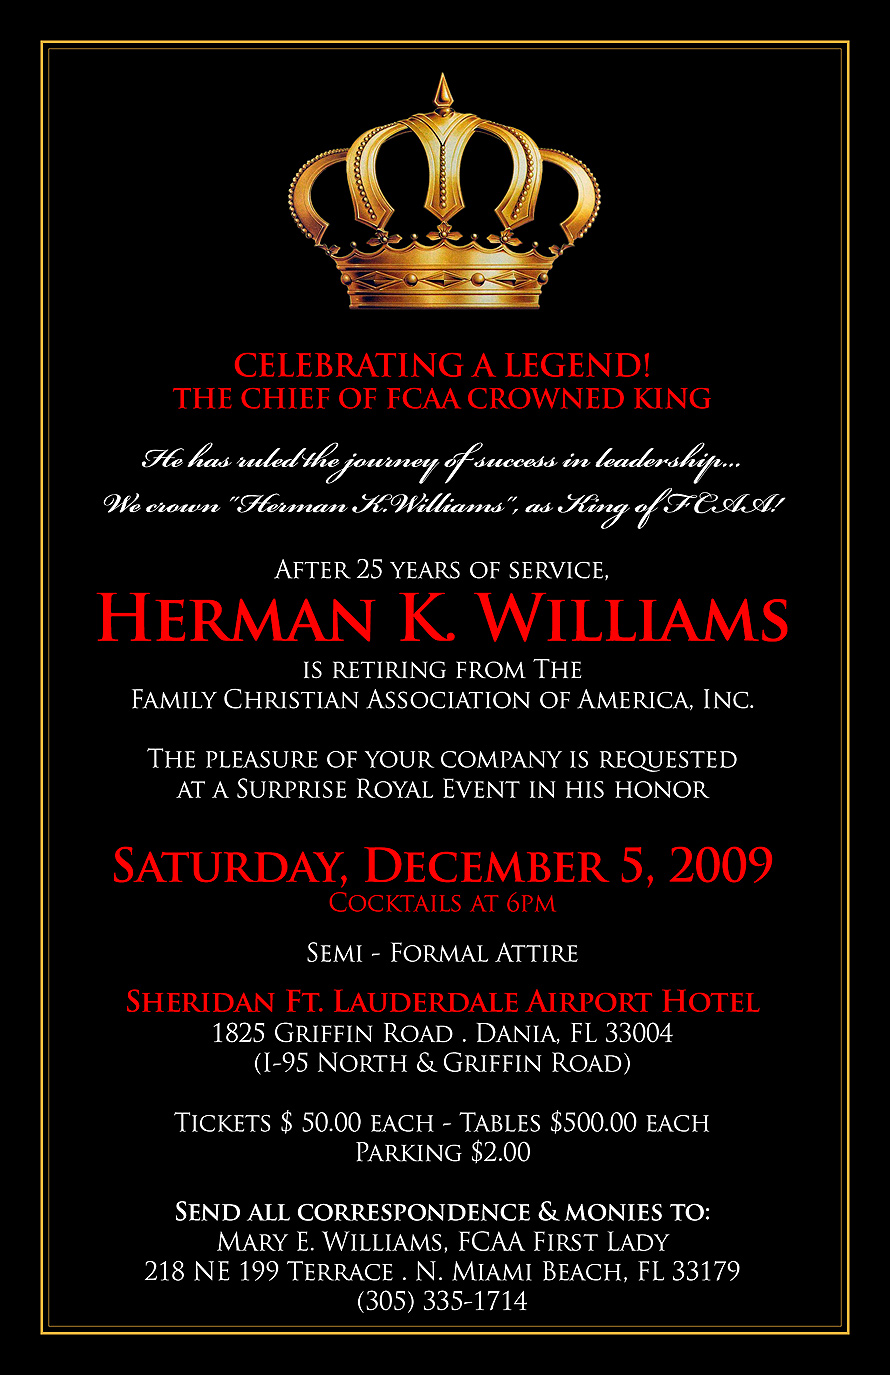 Celebrating a Legend Herman K. Williams